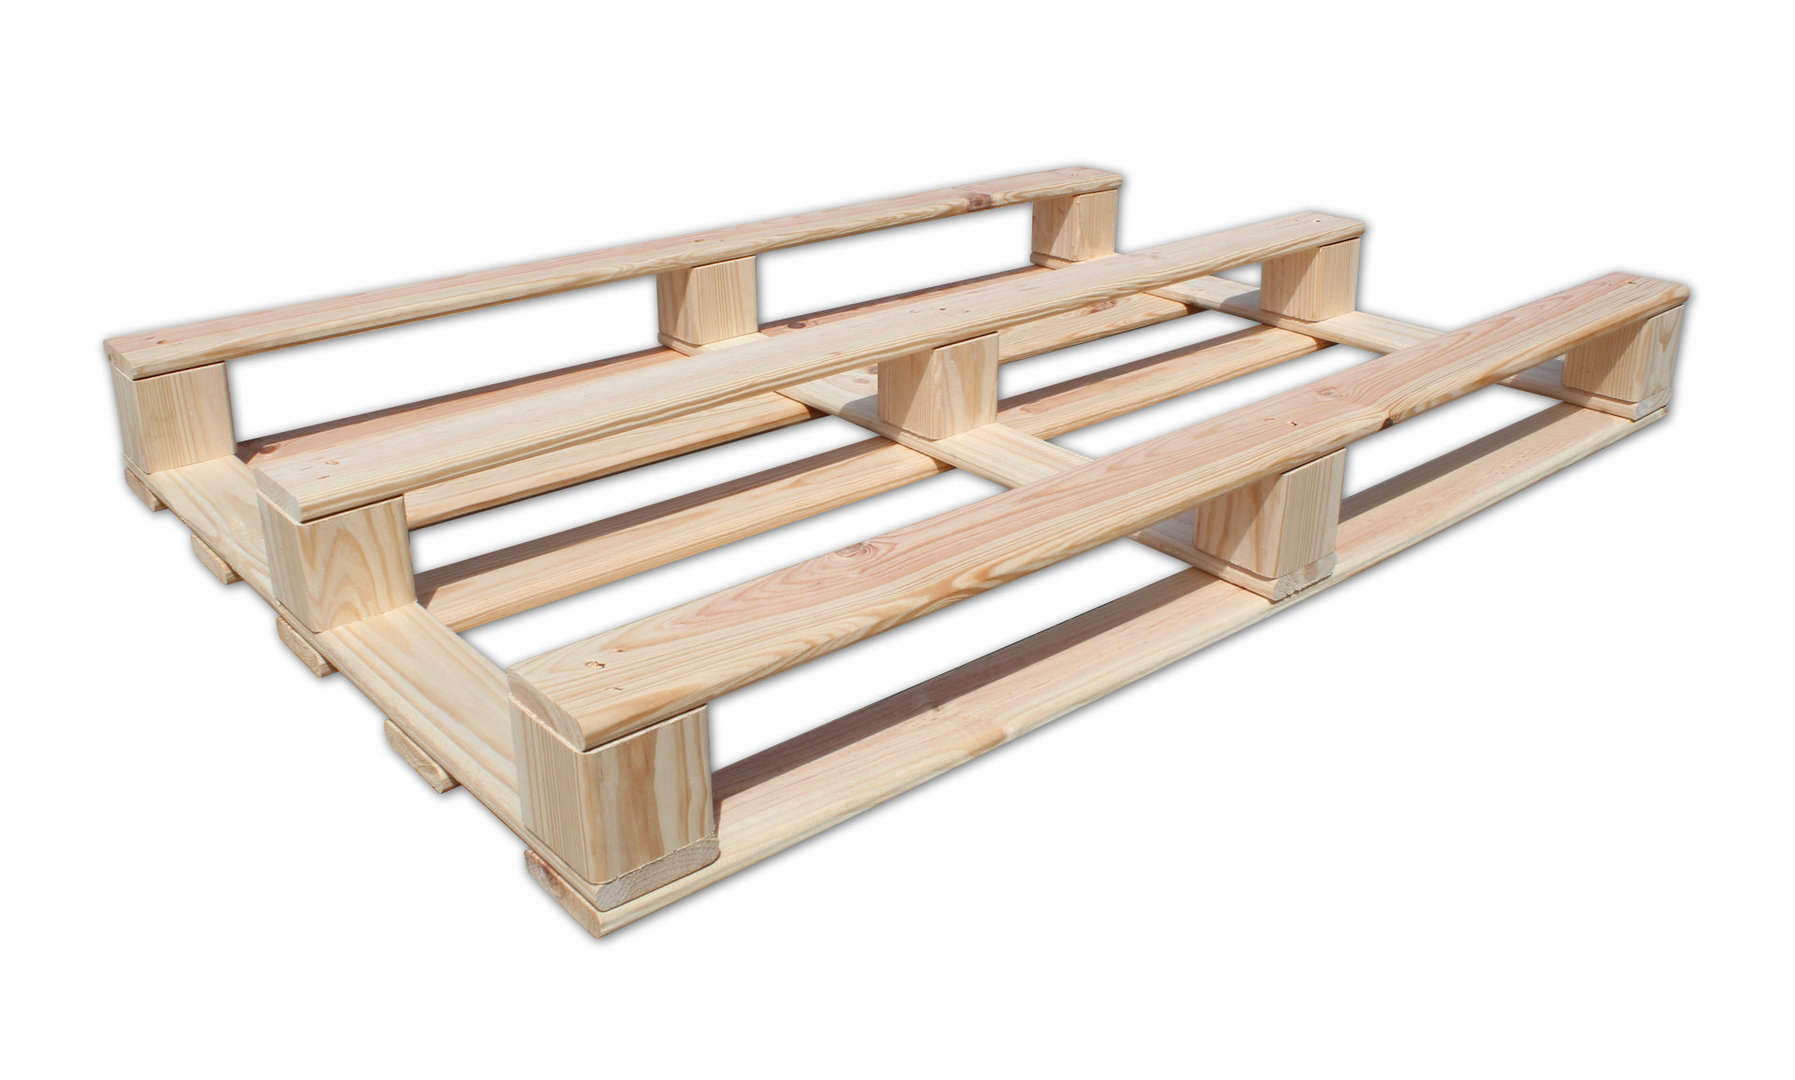 Palet 120 x 80 madera cepillada calidad premium - Palet de madera decoracion ...